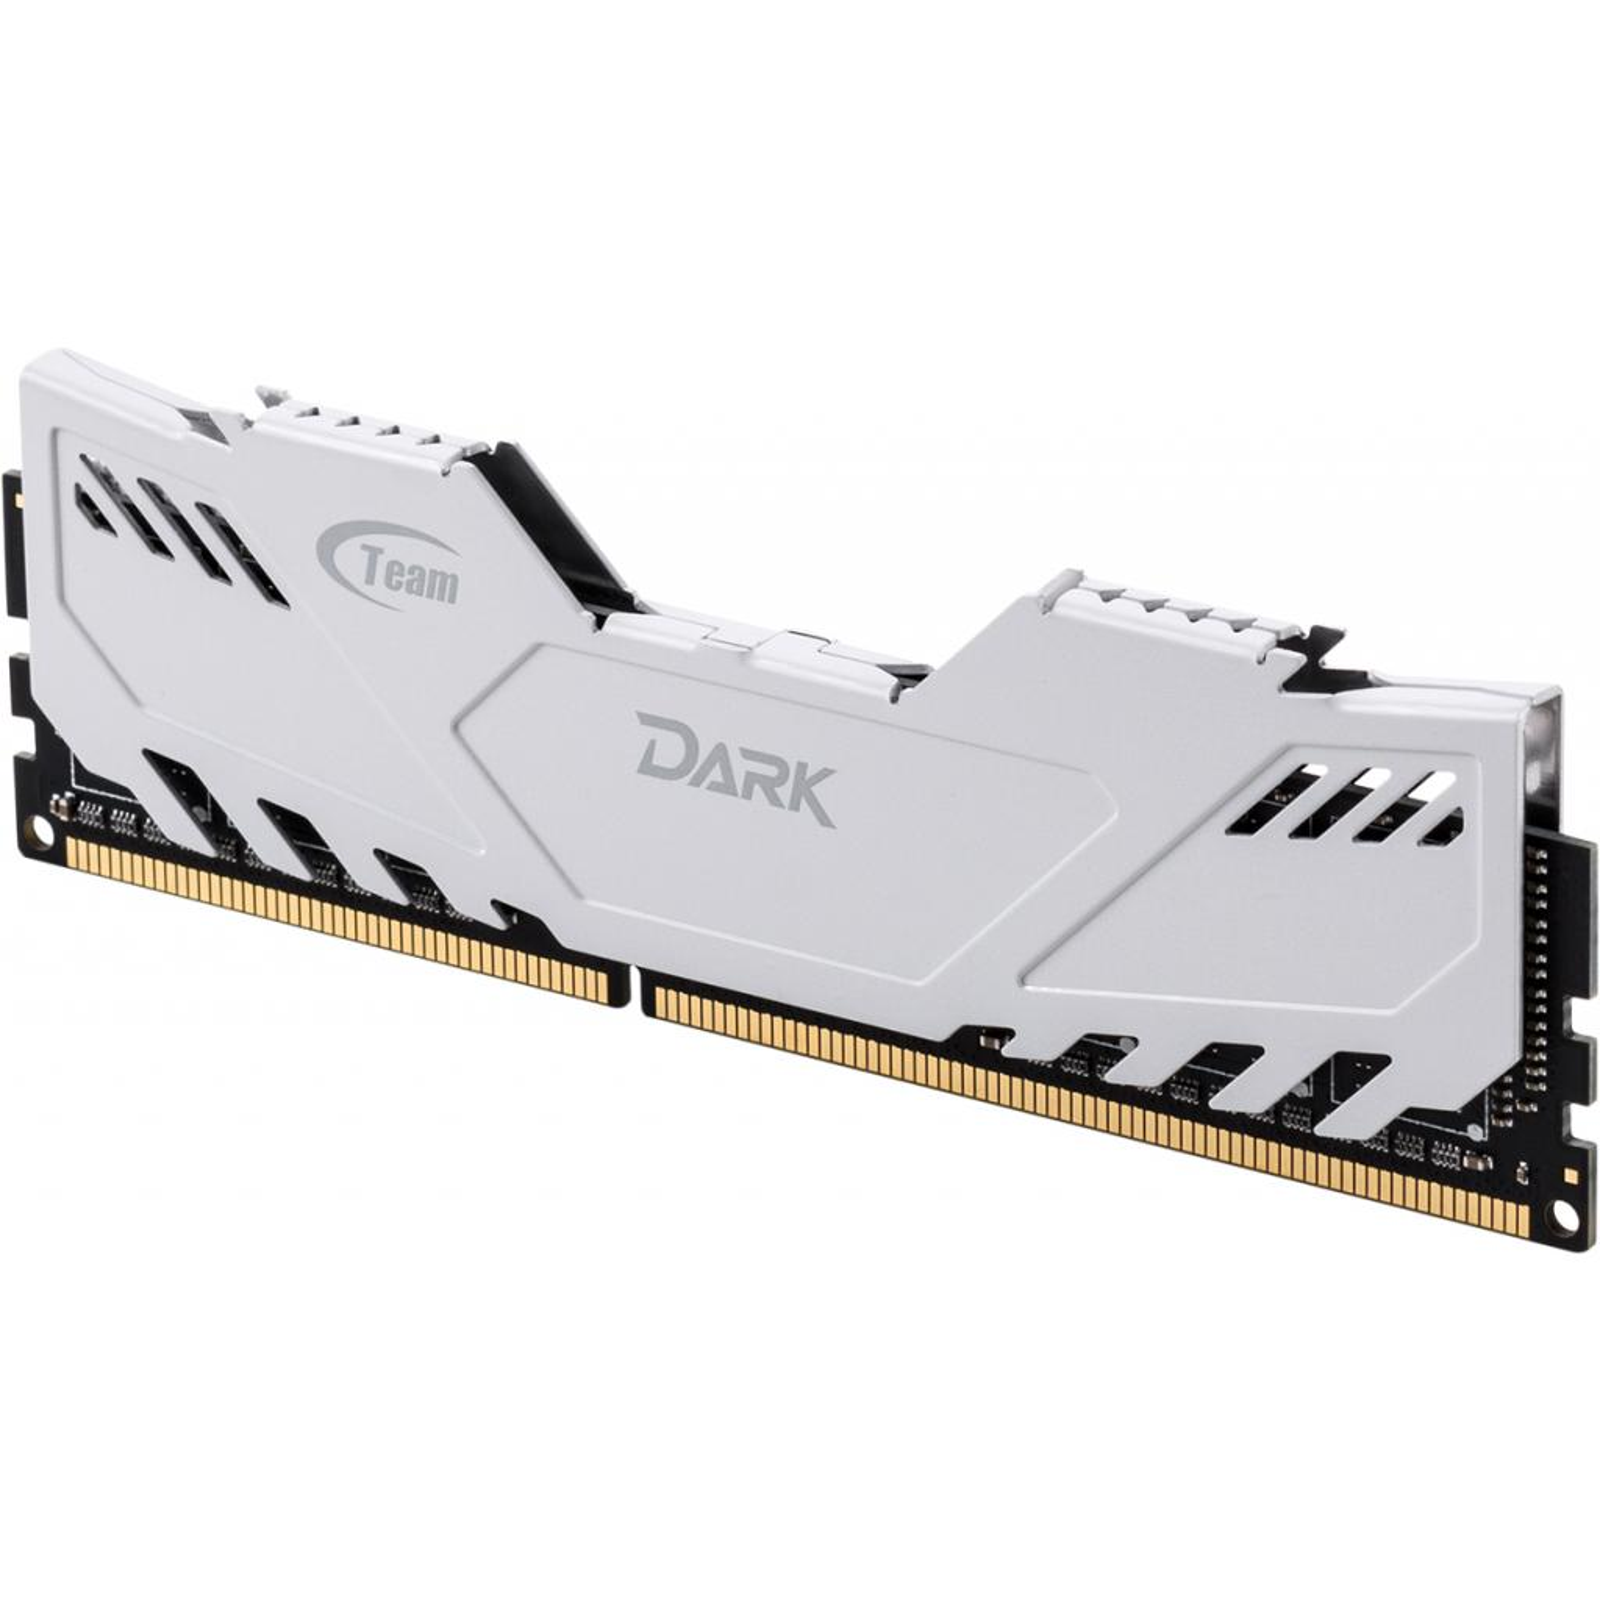 Модуль памяти для компьютера DDR3 4GB 1600 MHz Dark Series White Team (TDWED34G1600HC901) изображение 5